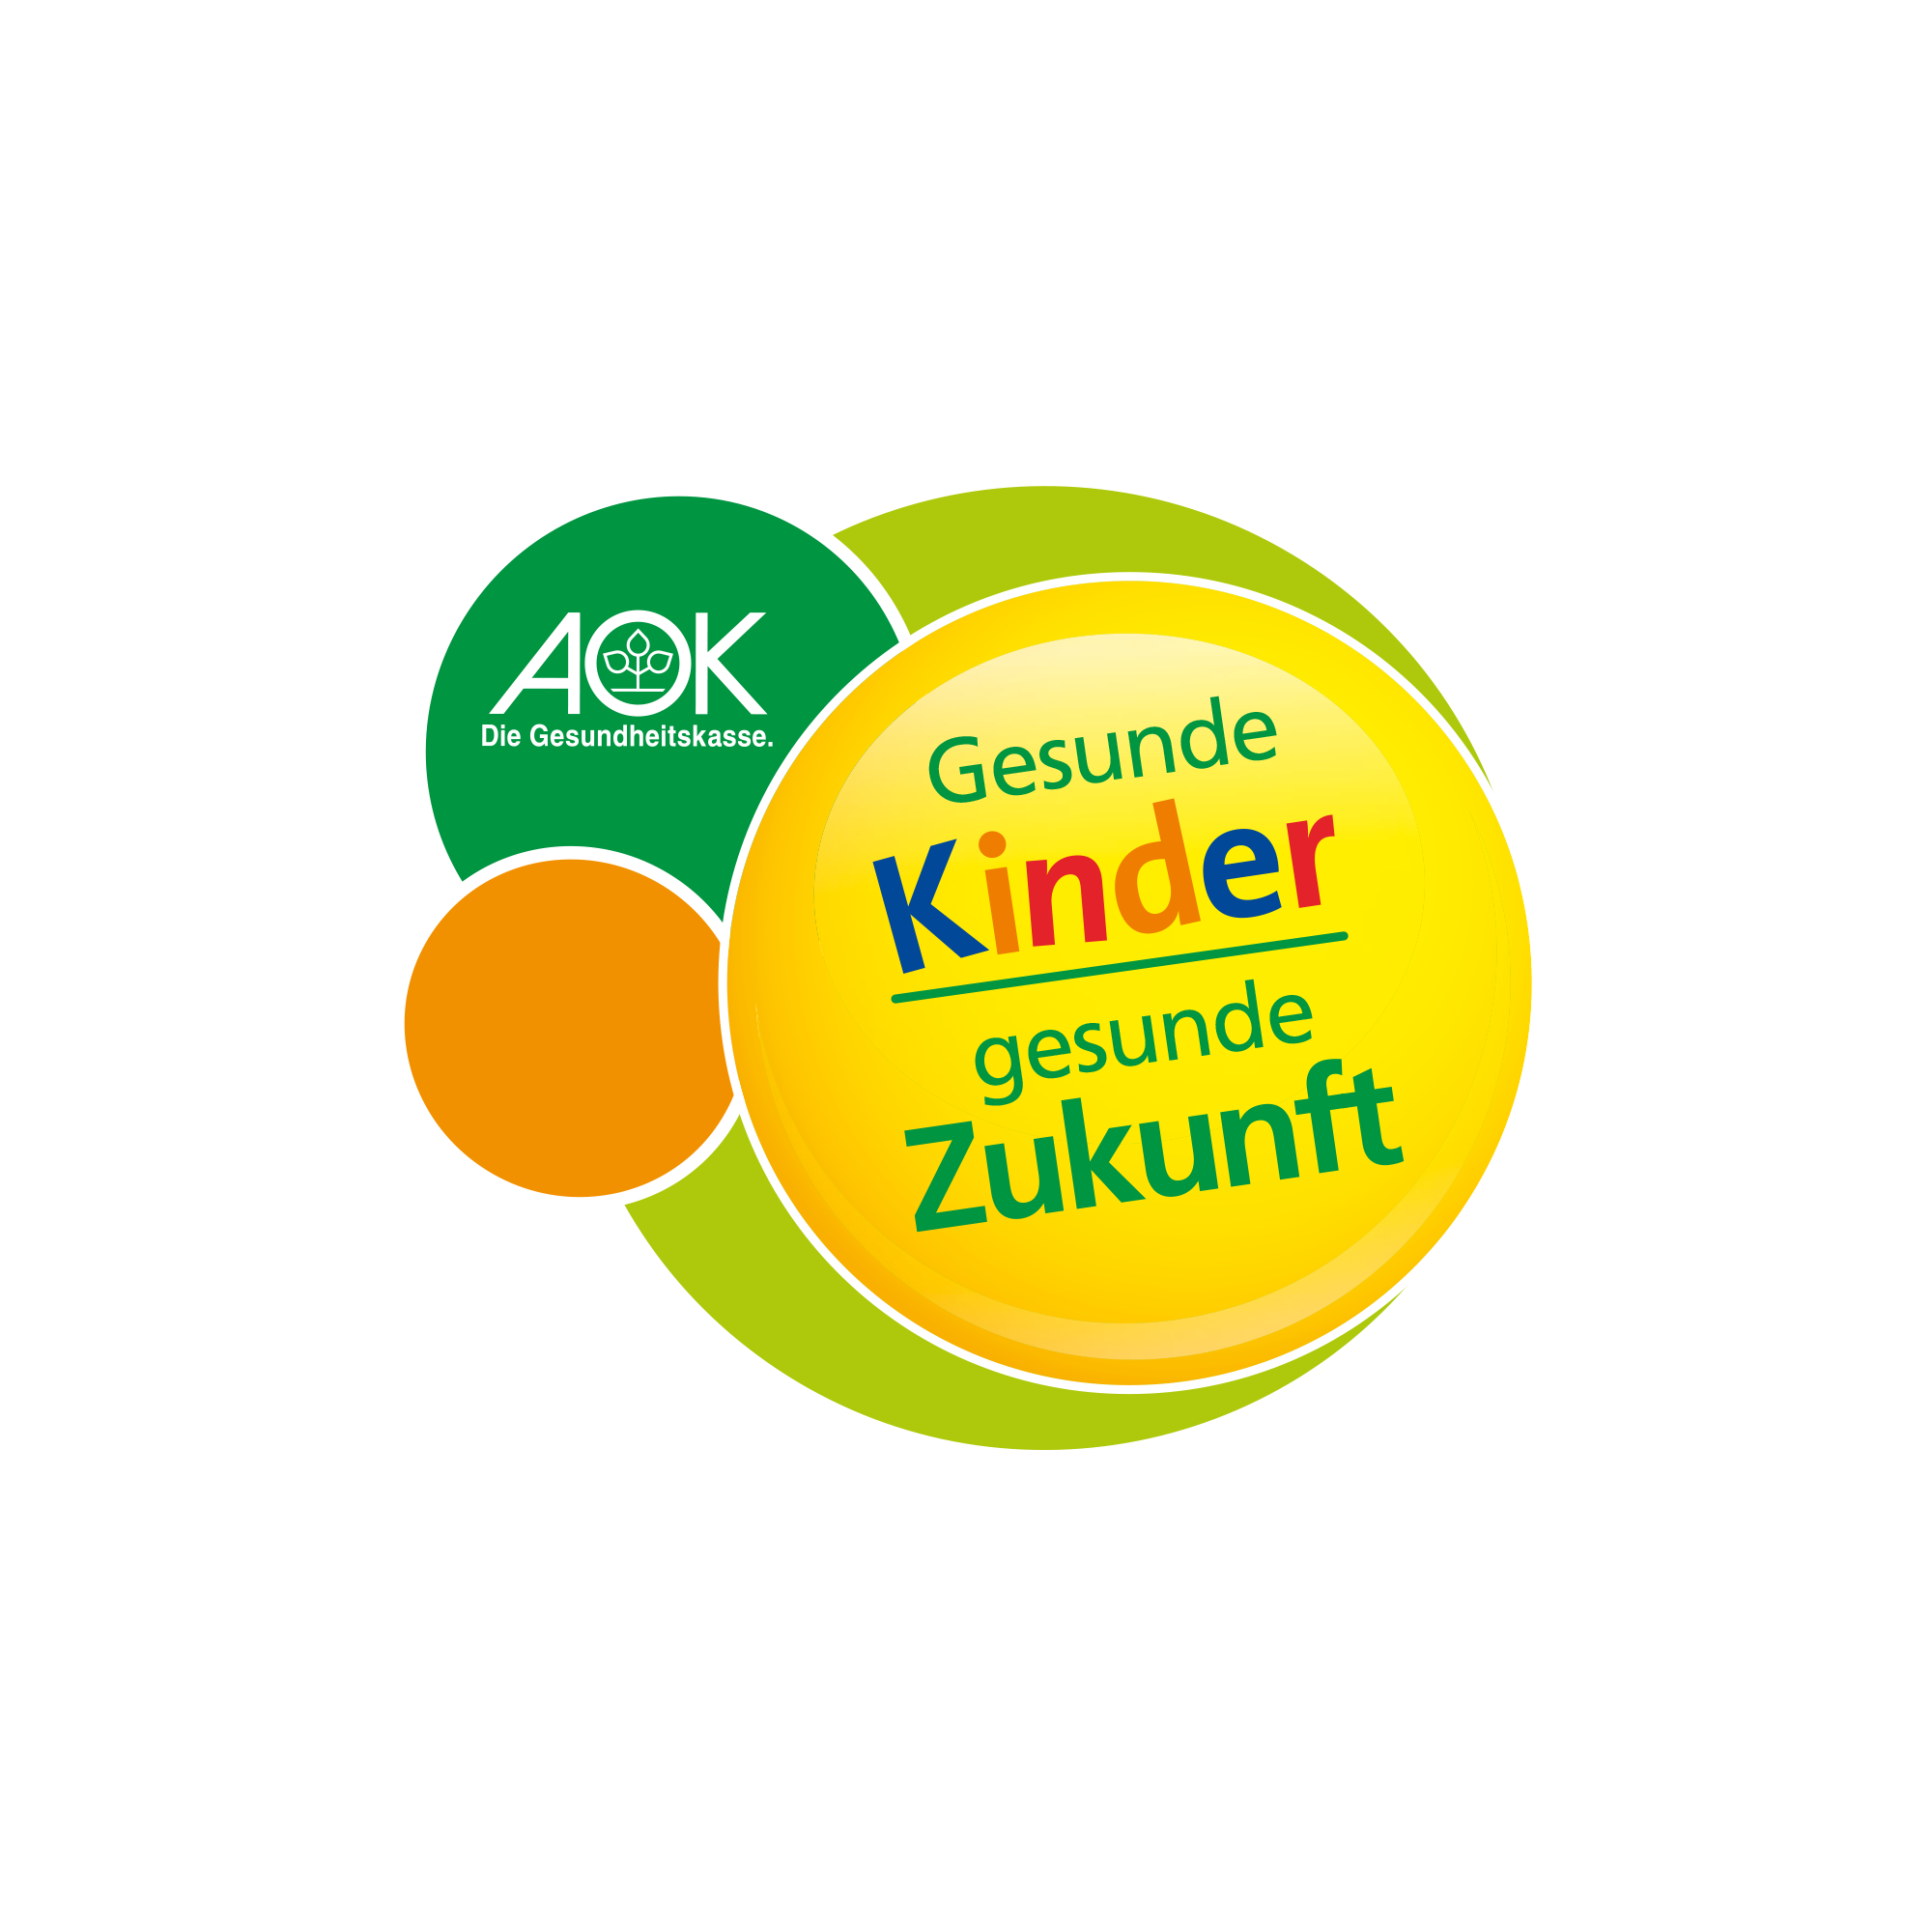 Gesunde Kinder, gesunde Zukunft Logo